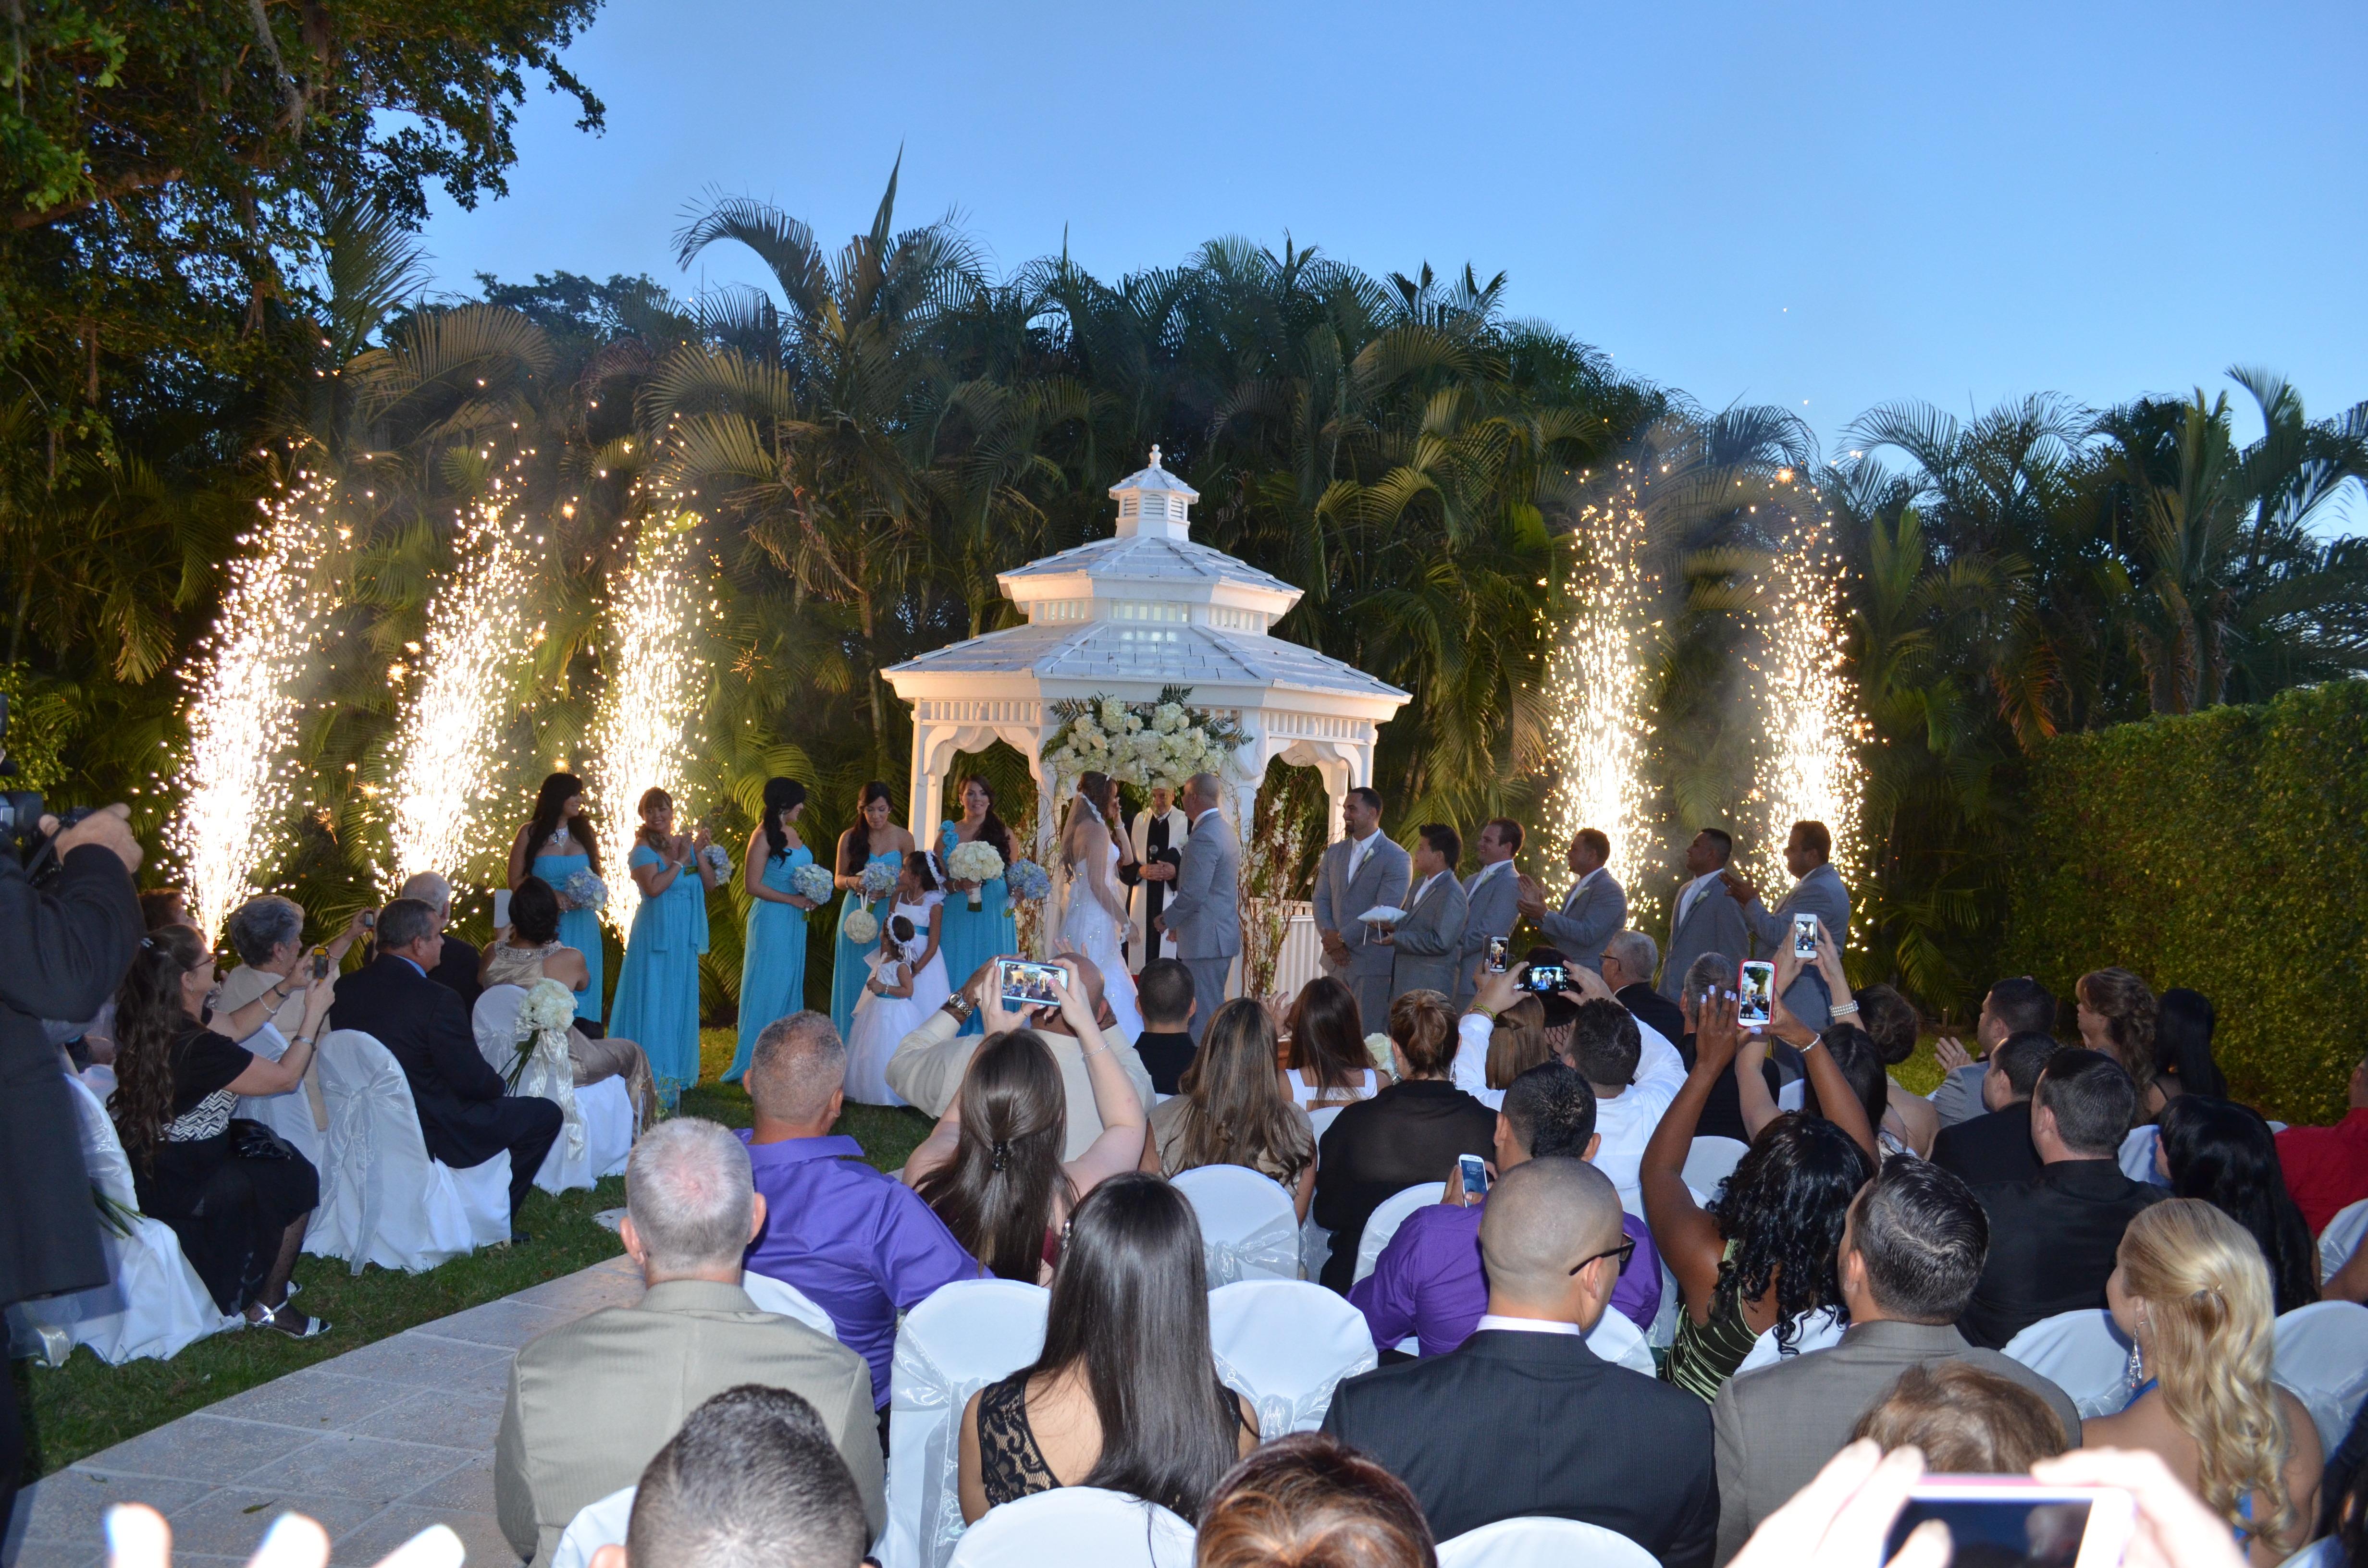 Yennis And Orlando Gazebo Ceremony And Wedding Reception